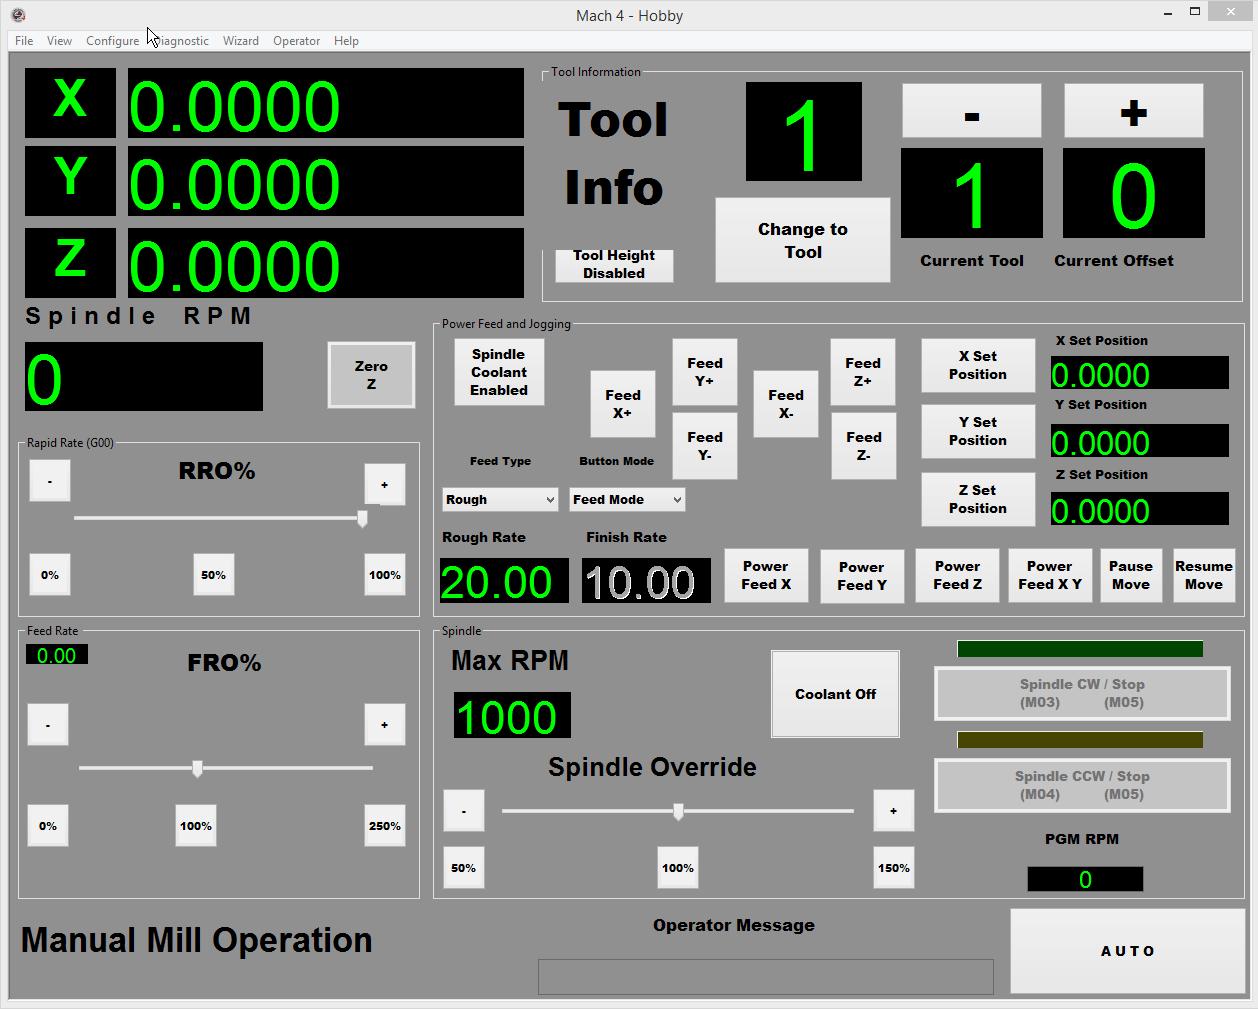 Mach4 Manual Mill Screen